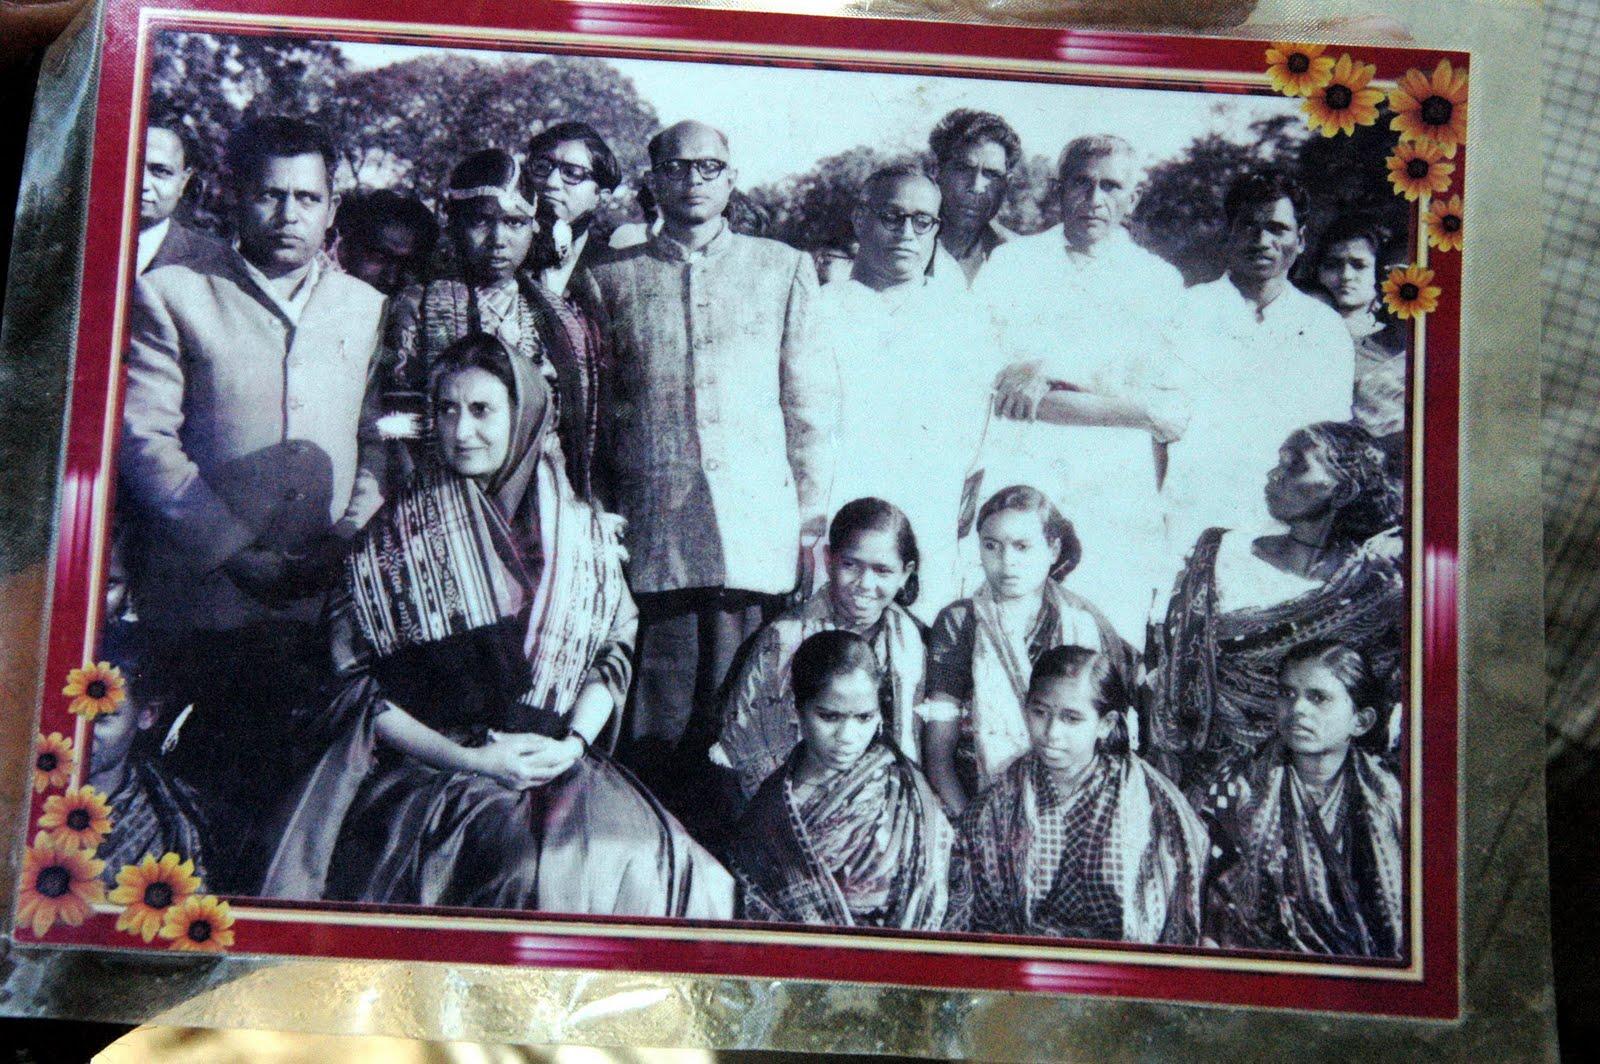 Pic courtesy : Sambalpurblogs by Ajit Nayak